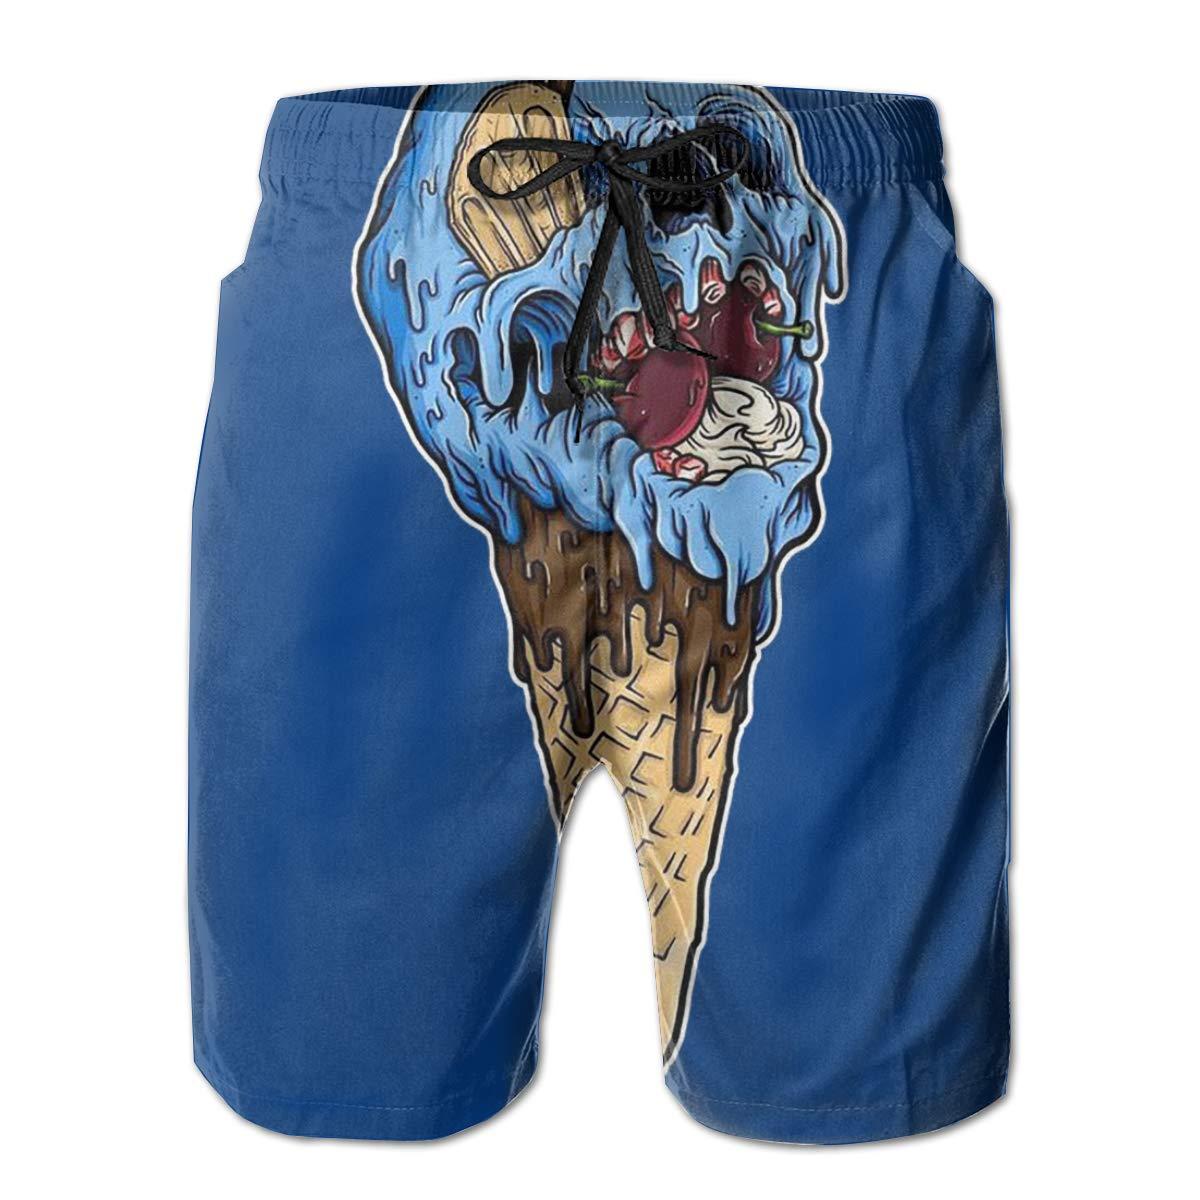 Hateone Mens Swimming Trunks Print Beach Shorts /& Pocket Teen Boy Mesh Lining